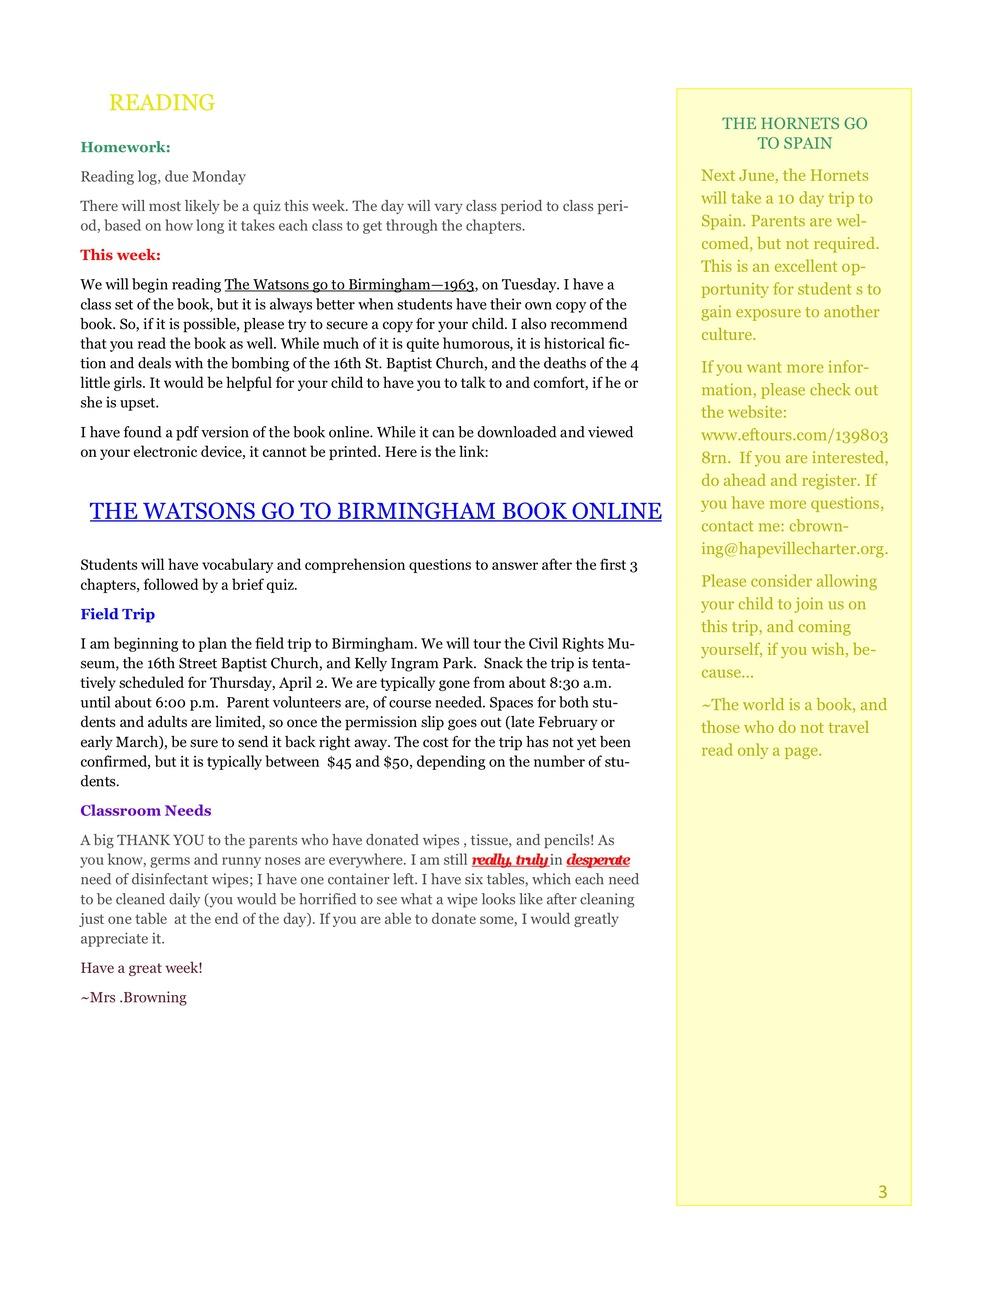 Newsletter Image6th grade January 20-23 3.jpeg